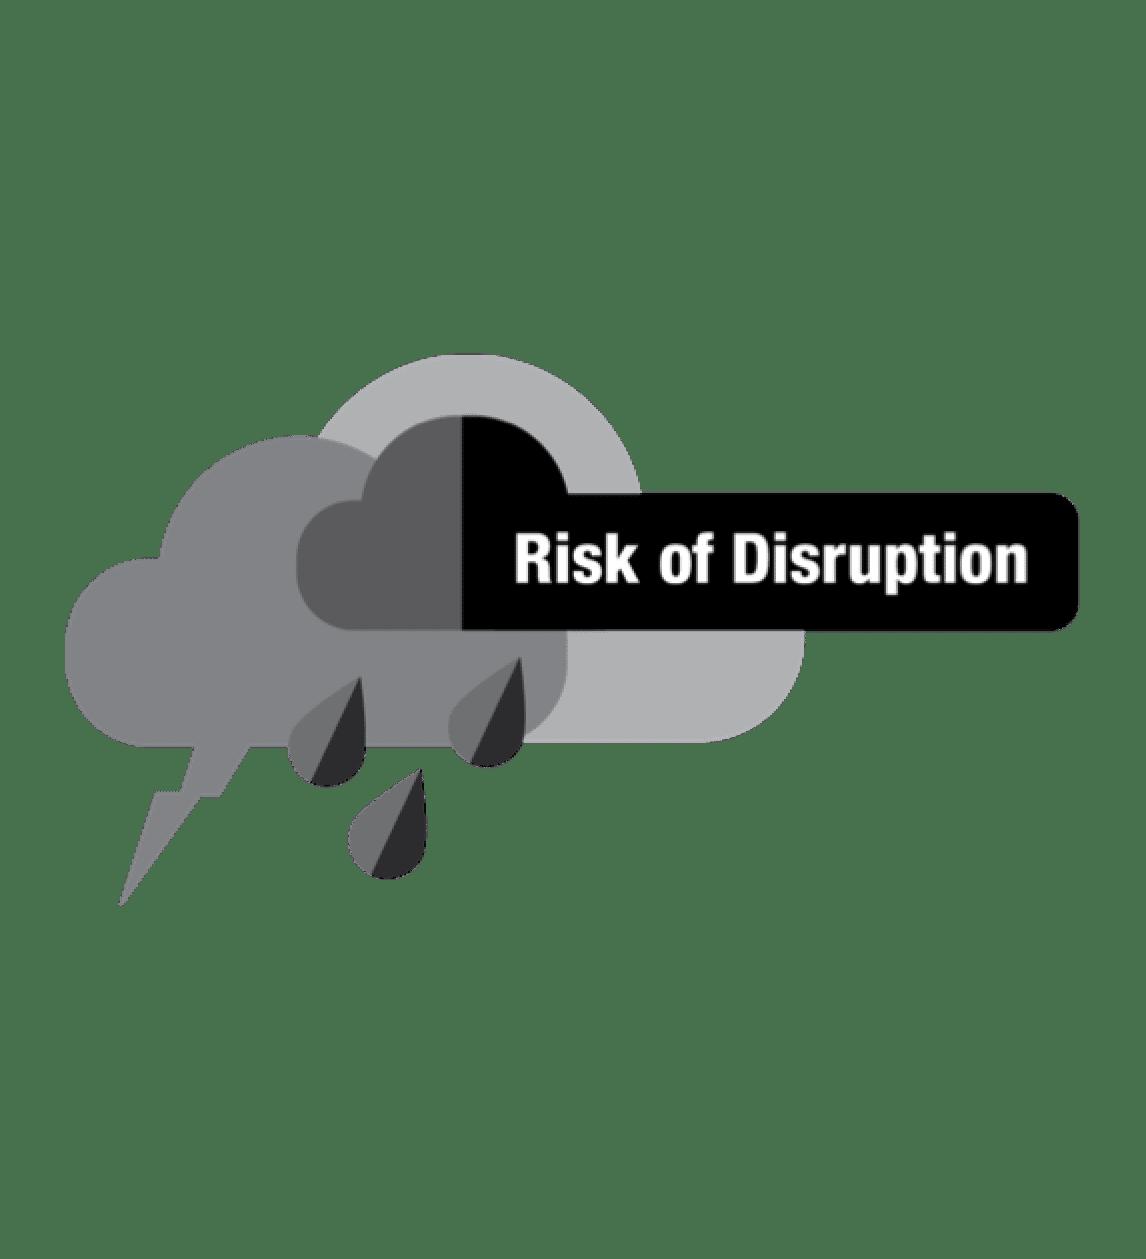 Risk-of-Disruption2